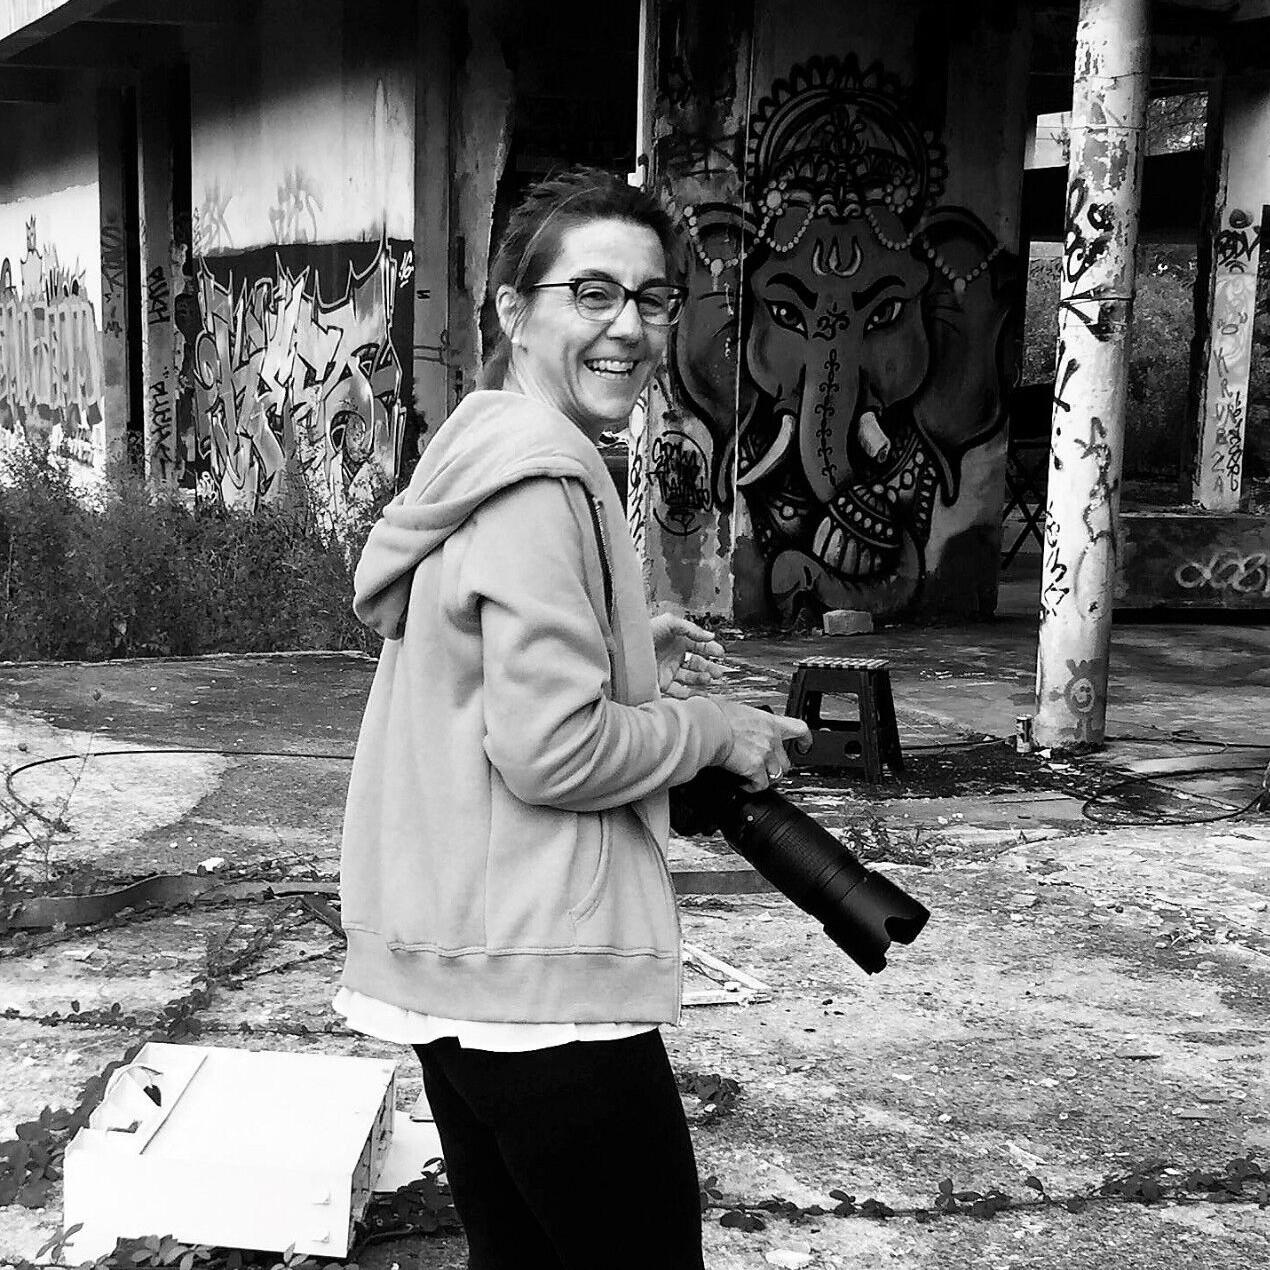 Photographes - Grasse